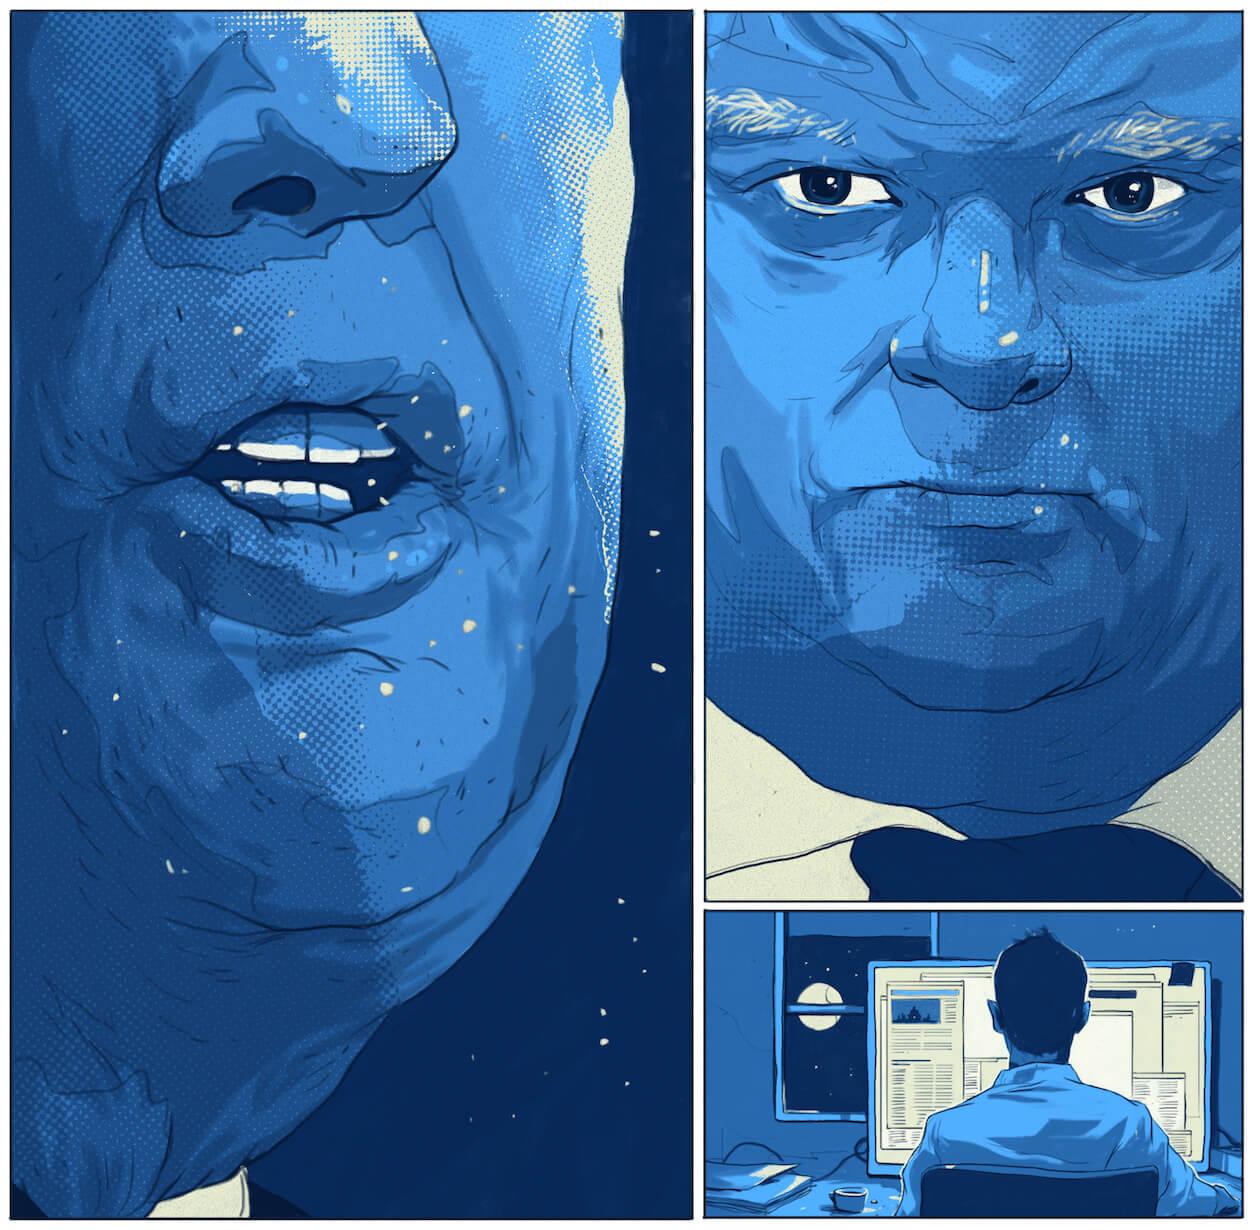 Illustration by Simon Prades